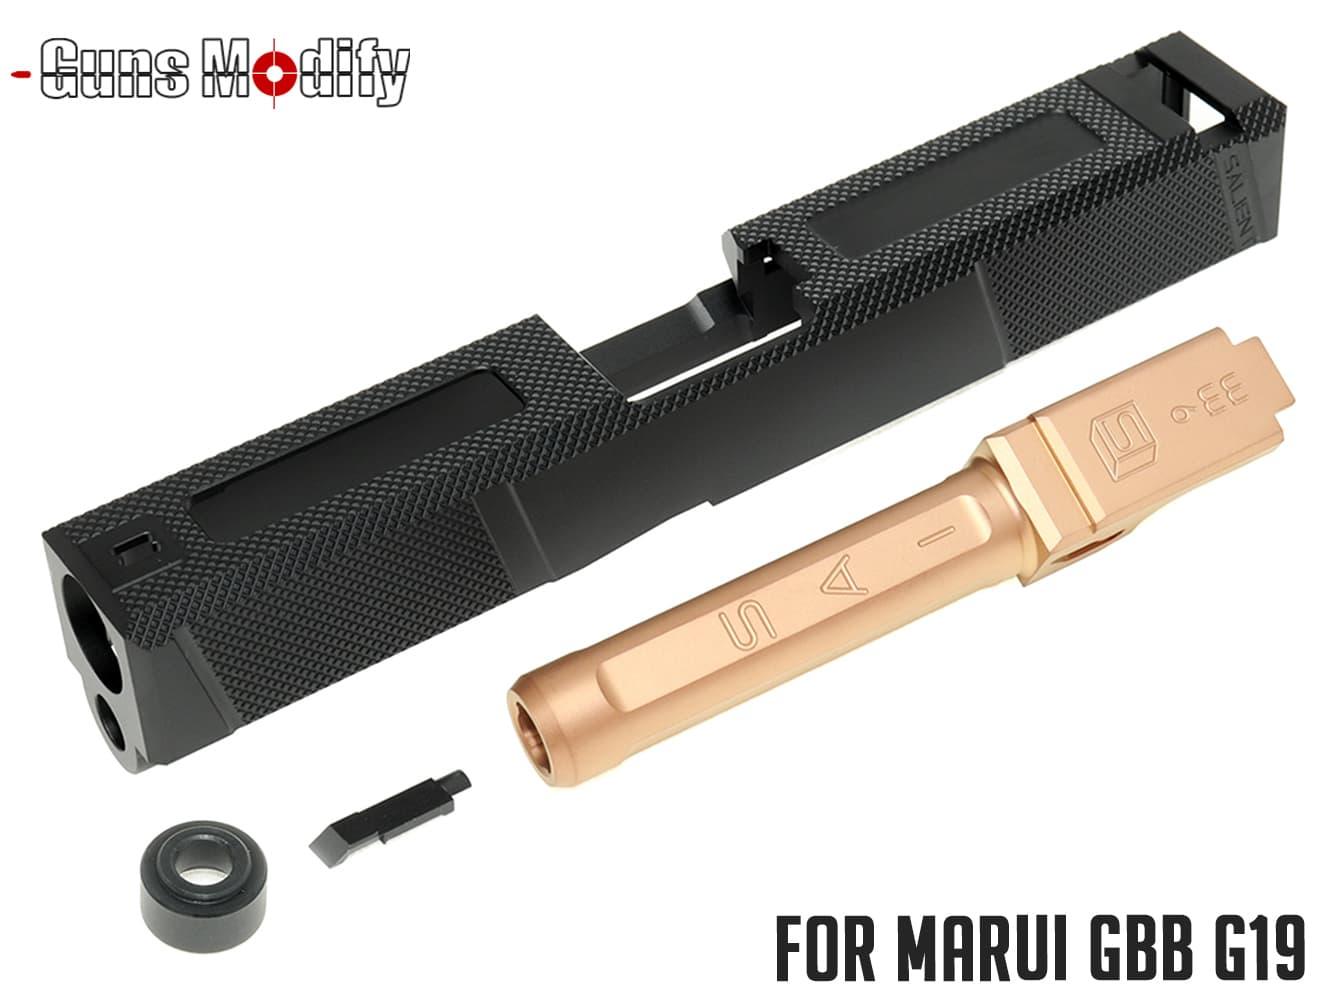 Guns Modify G19 SA Tier1UTスタイル アルミスライド&ボックスフルートステンレスバレル ローズゴールド◆マルイ新型G19 SAI Utilityタイプ